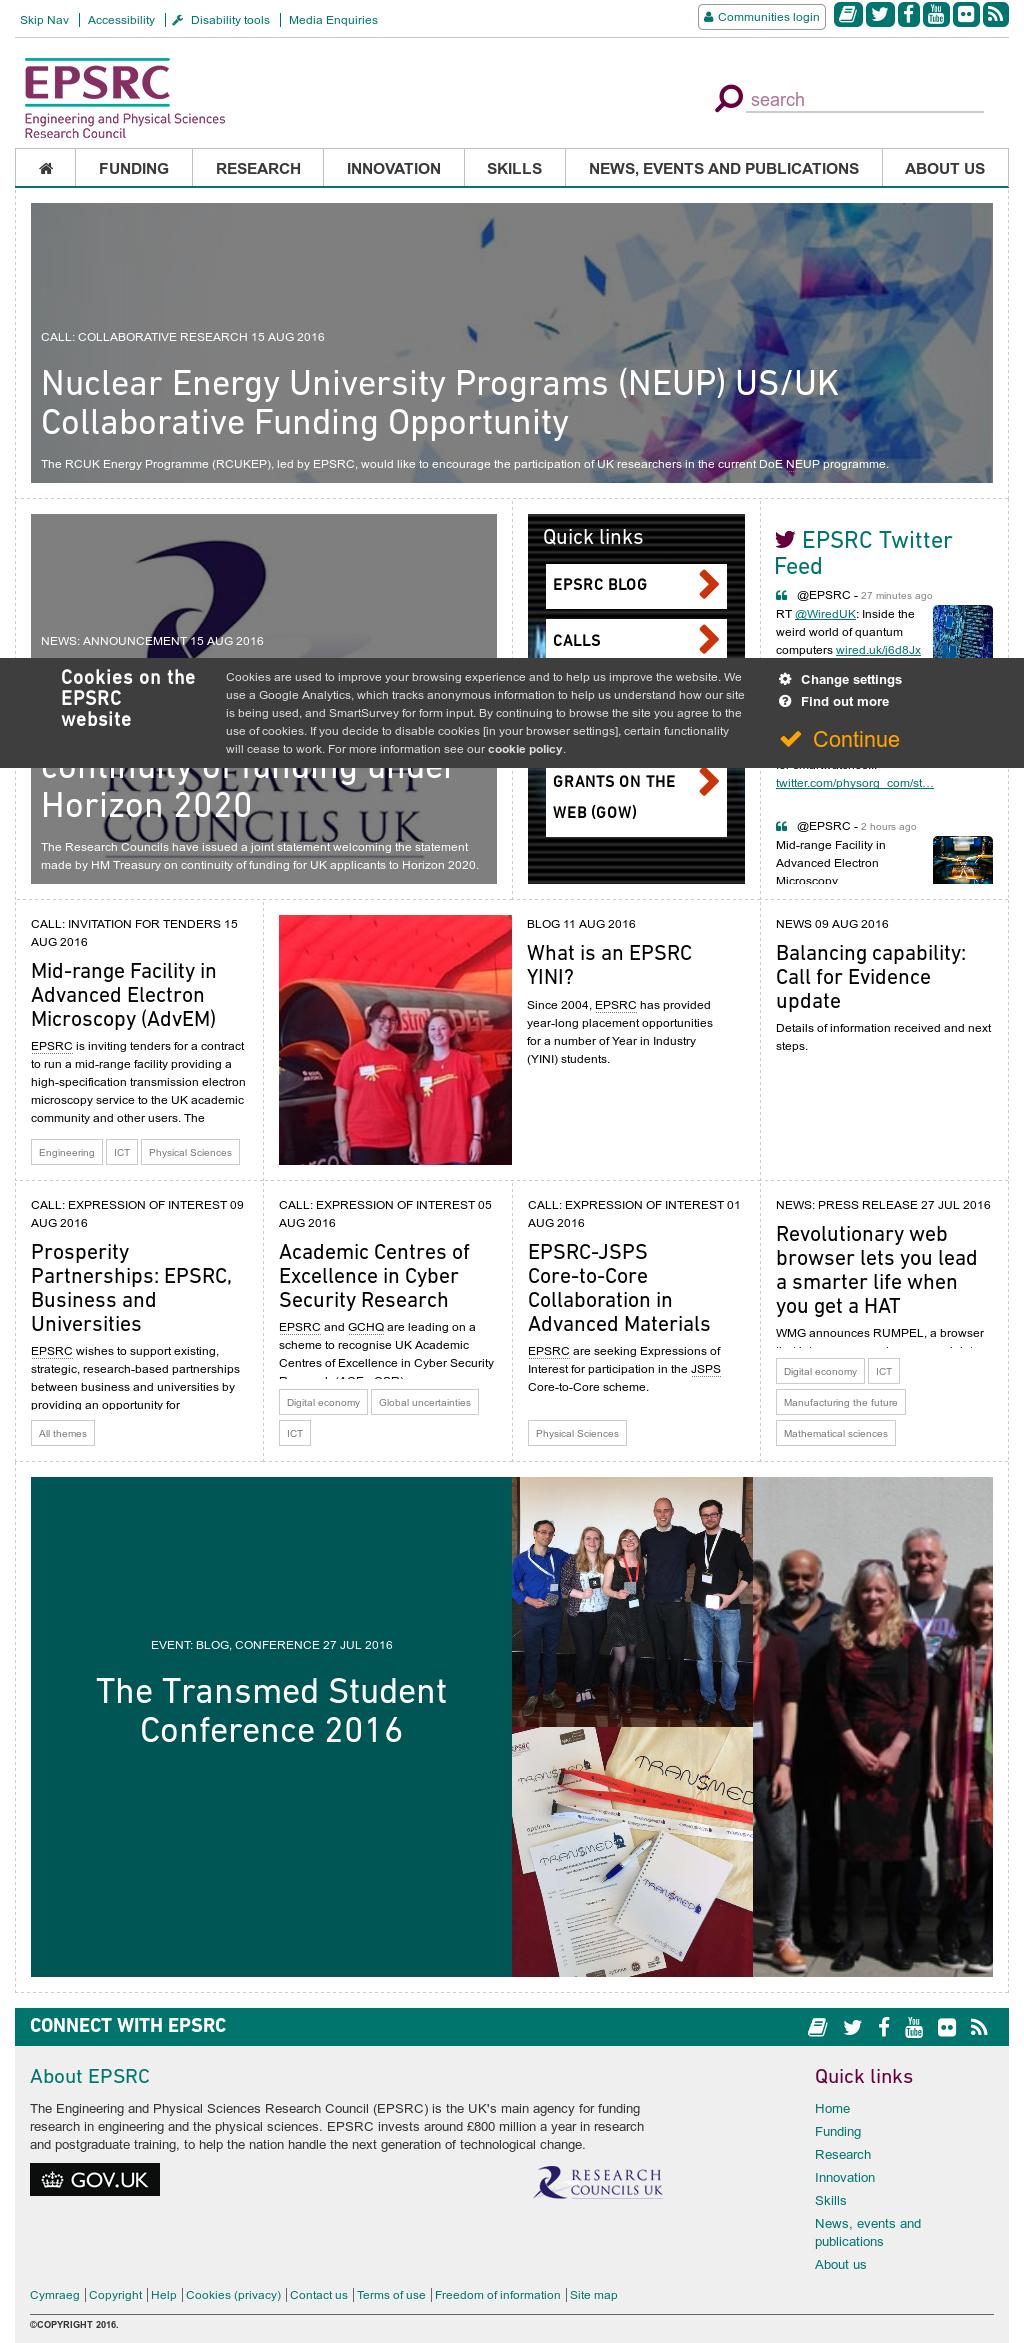 EPSRC Competitors, Revenue and Employees - Owler Company Profile